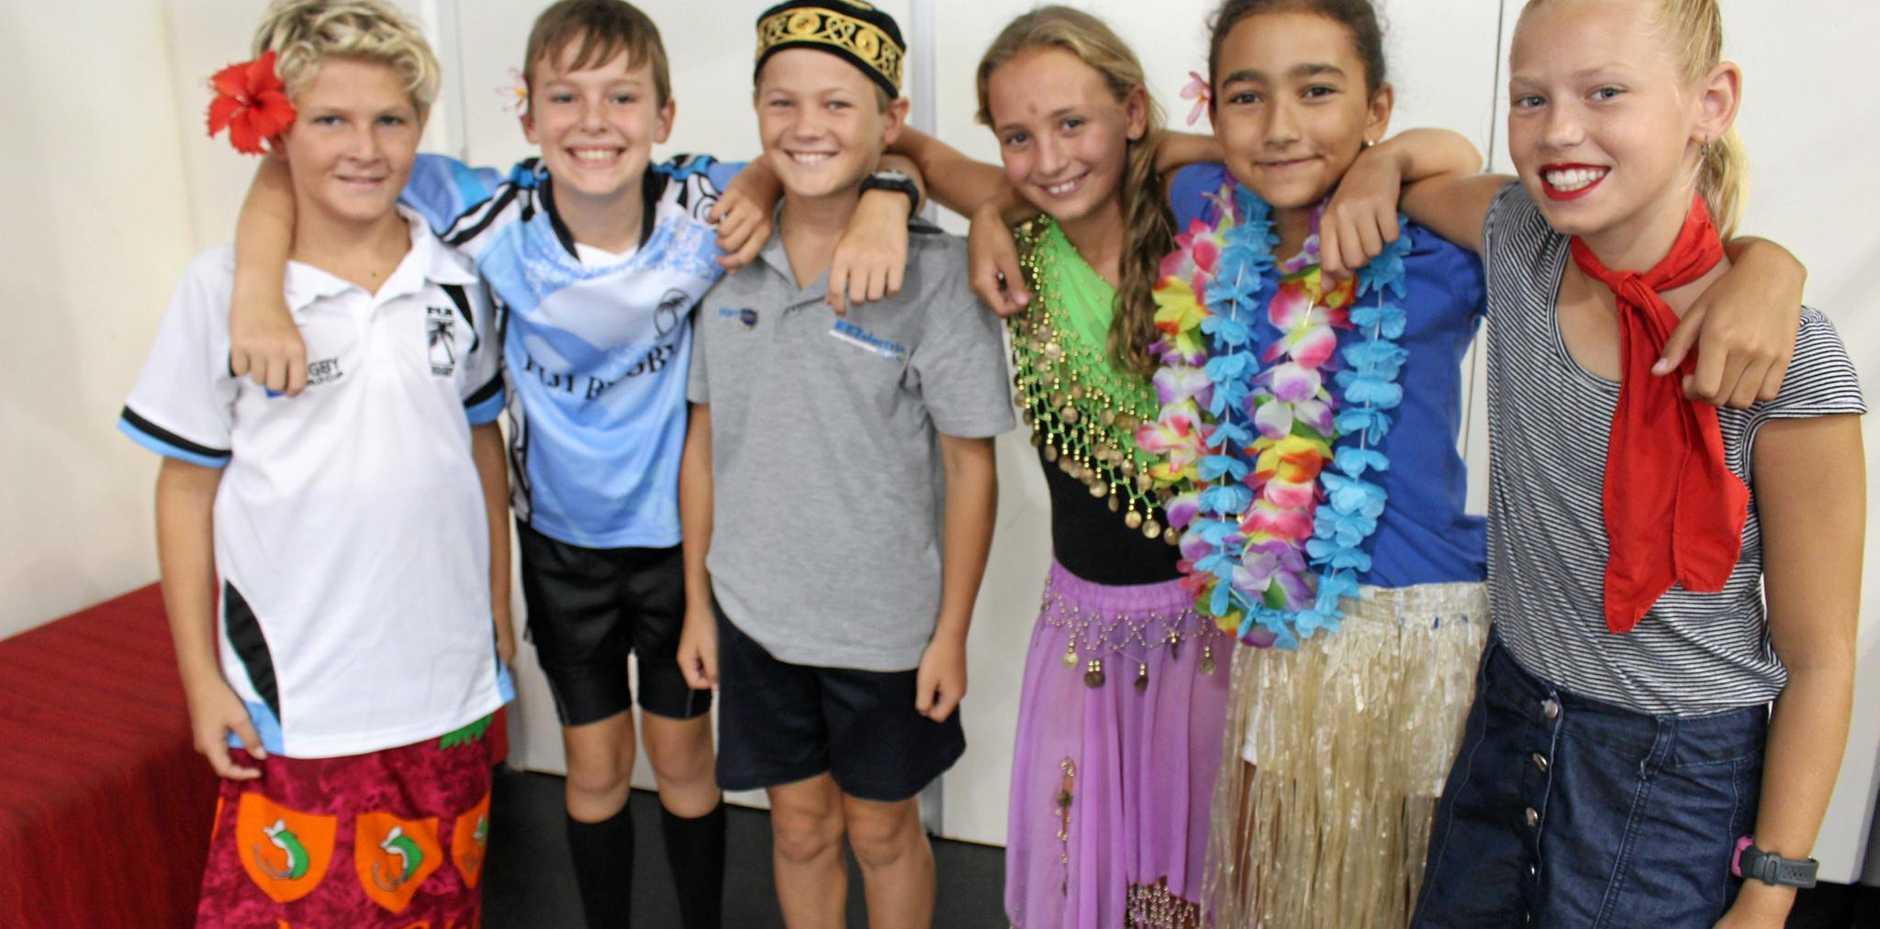 ONE BIG, HAPPY SCHOOL: Tom Sturgeon, Jake Veldman, Harry Rezek, Lucy Wolfenden, Tara Sokovagone and Ash Tanner enjoy Harmony Day at Kawana Waters State College this month.